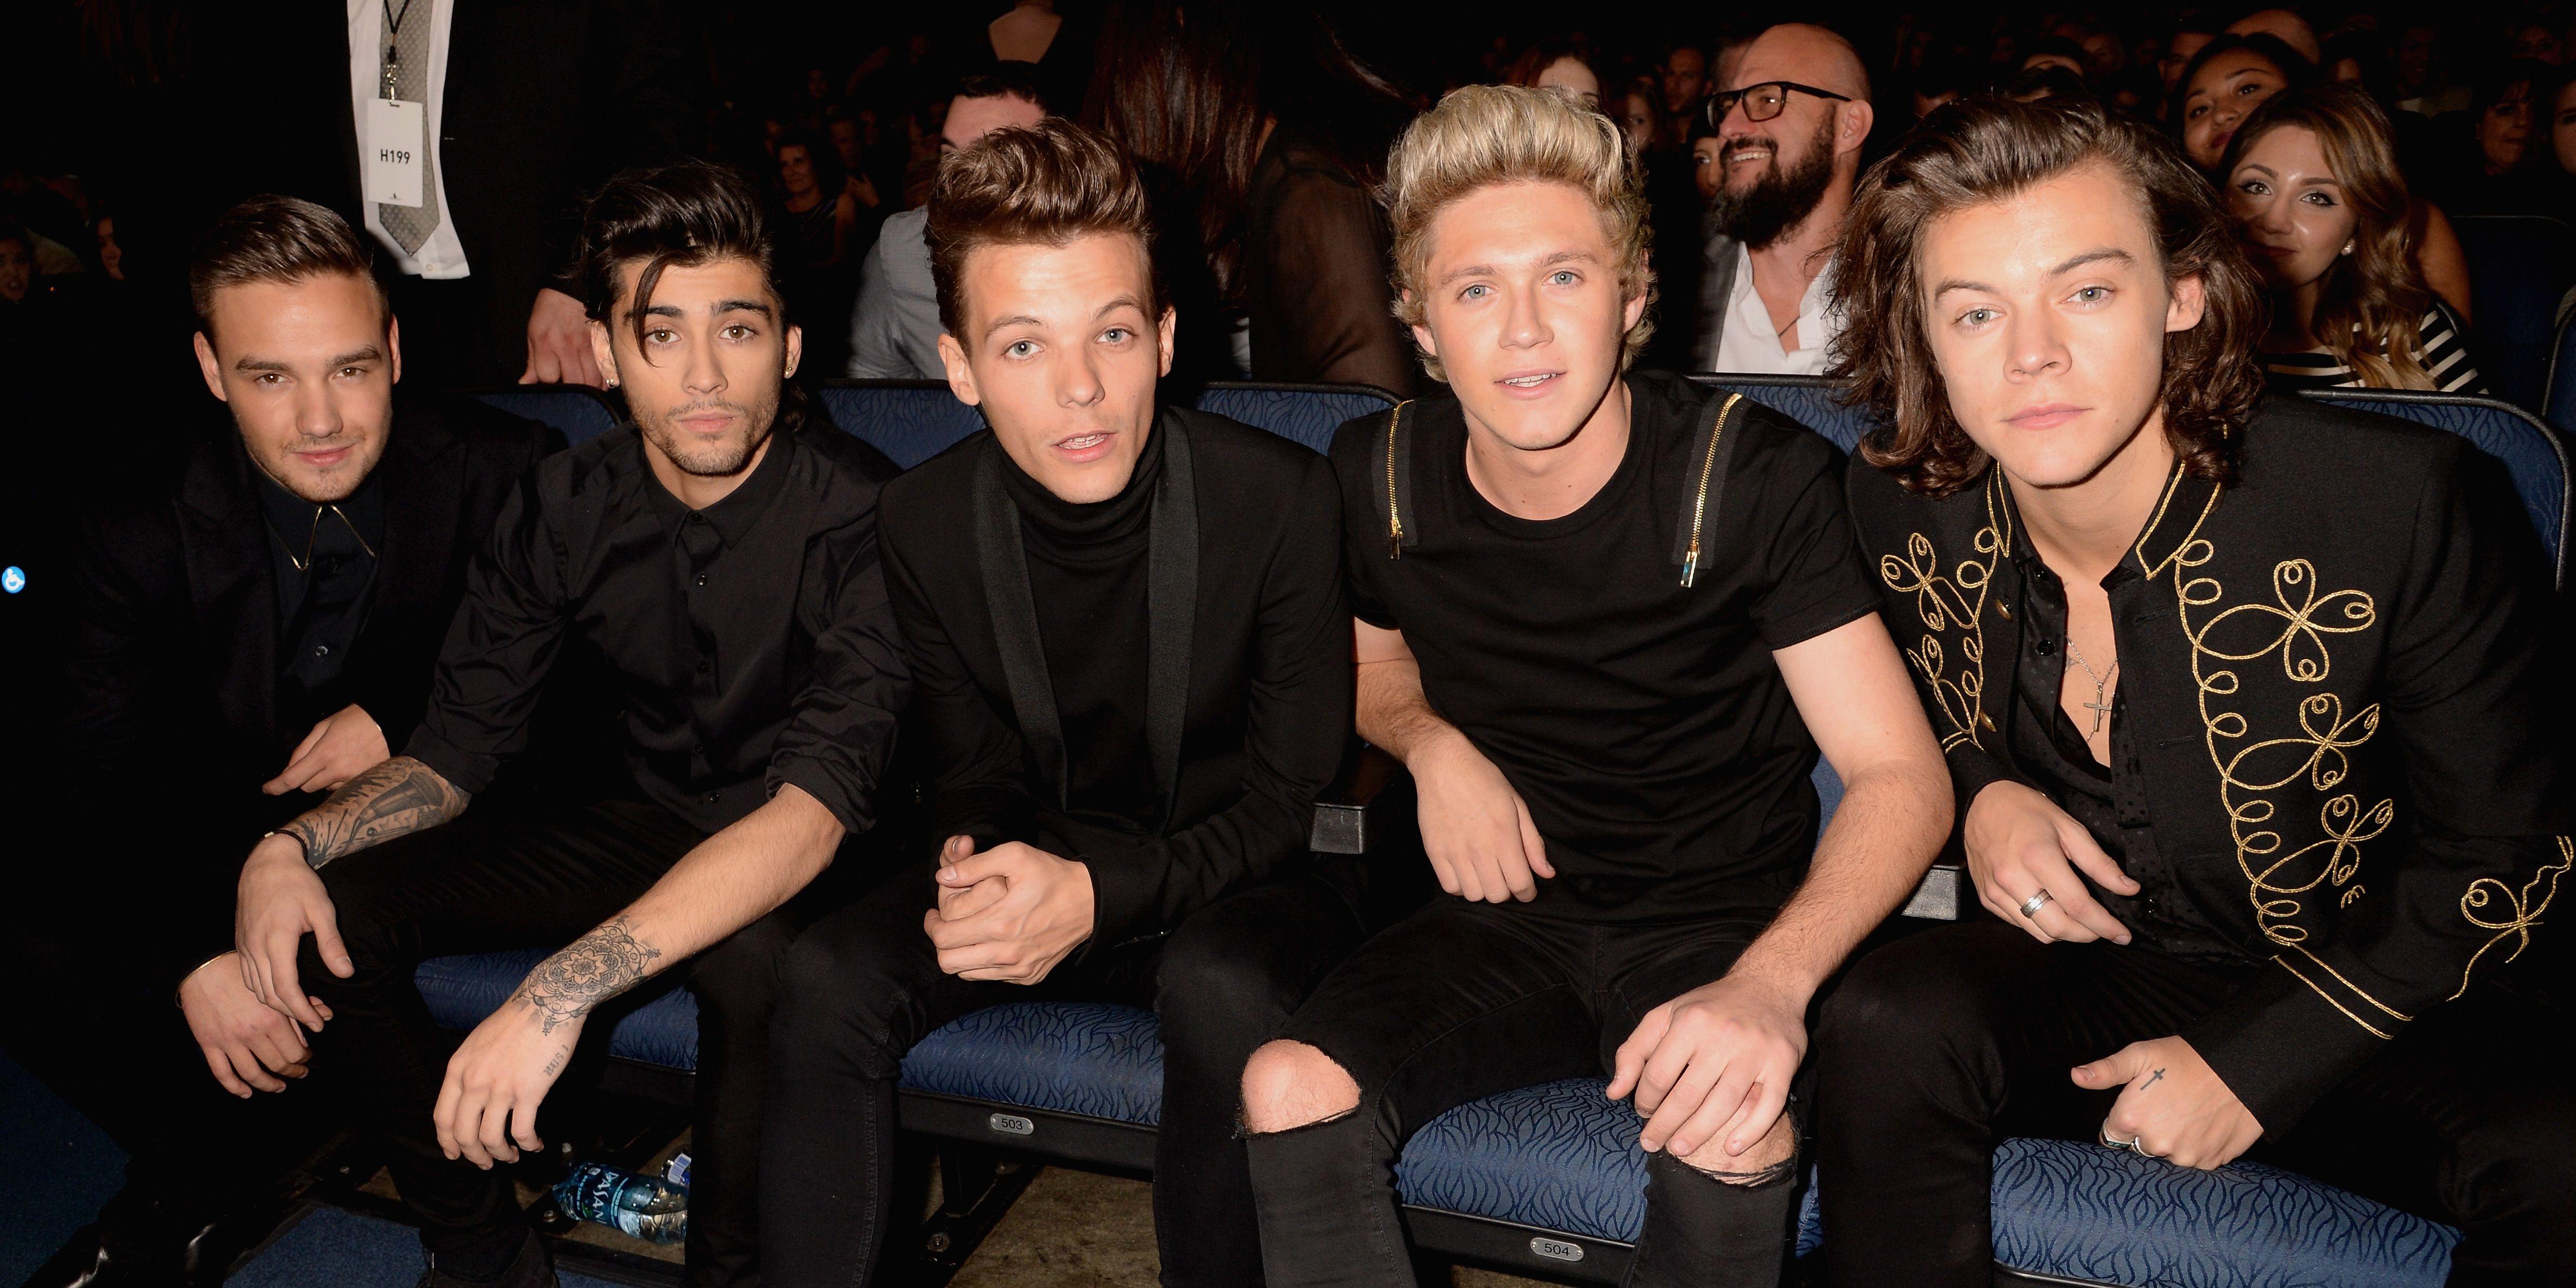 One Direction: Harry Styles, Liam Payne, Louis Tomlinson, Niall Horan, Zayn Malik